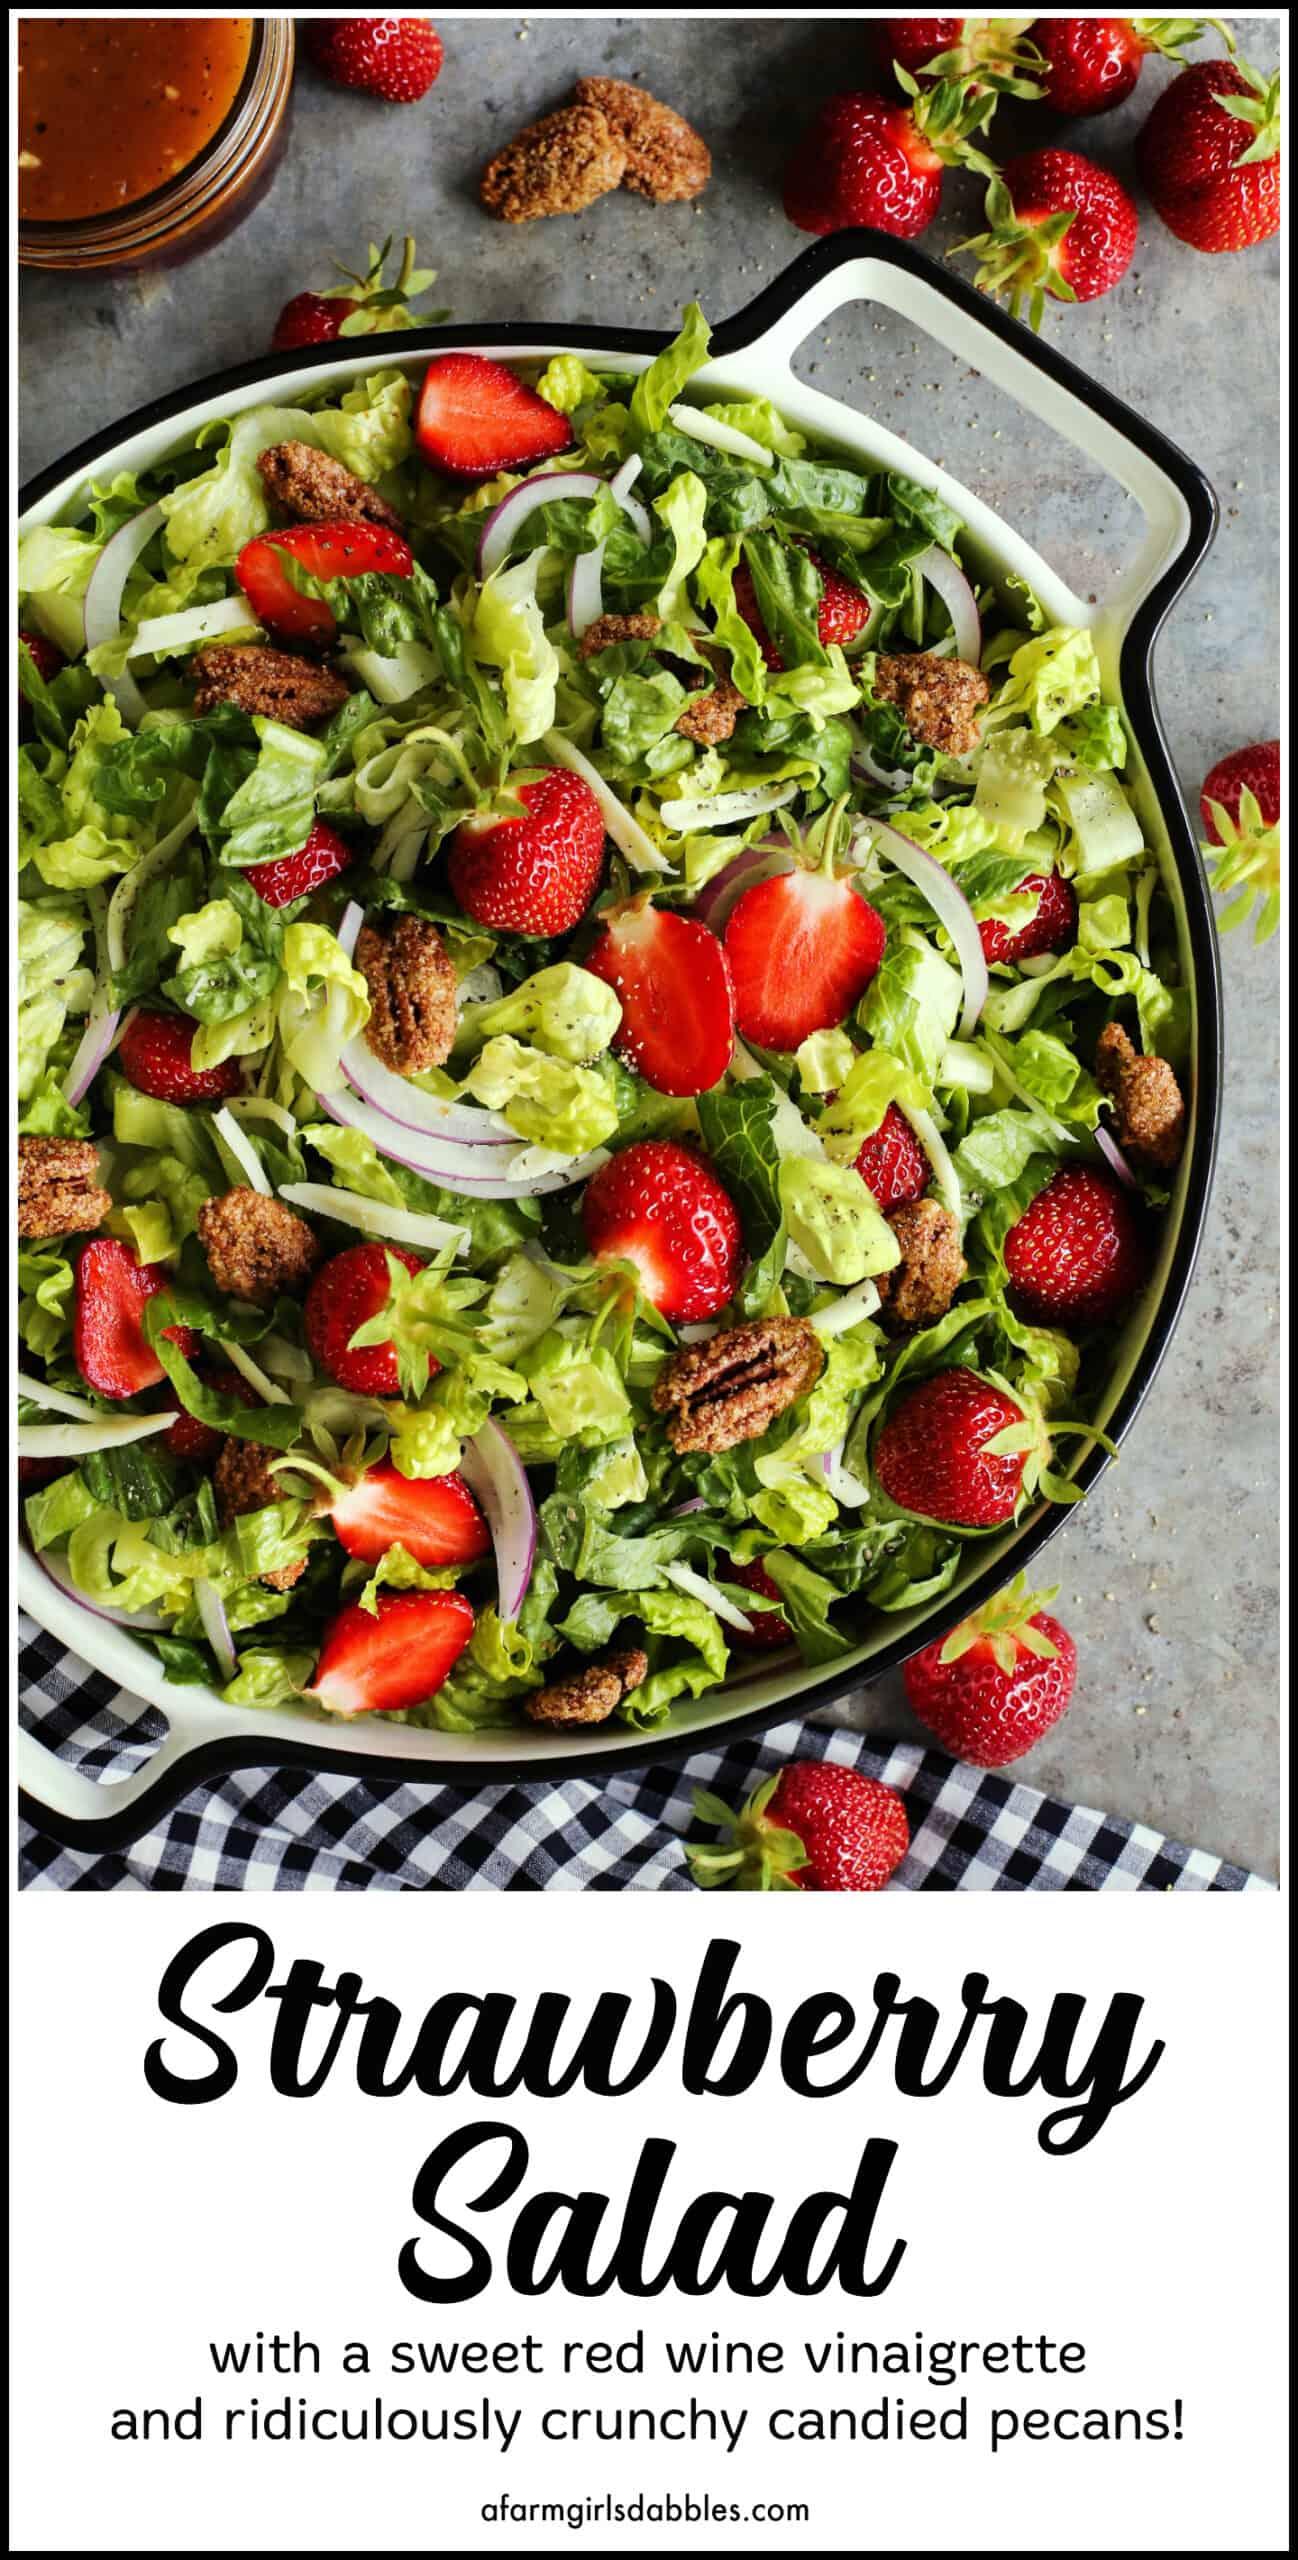 Pinterest image of strawberry salad